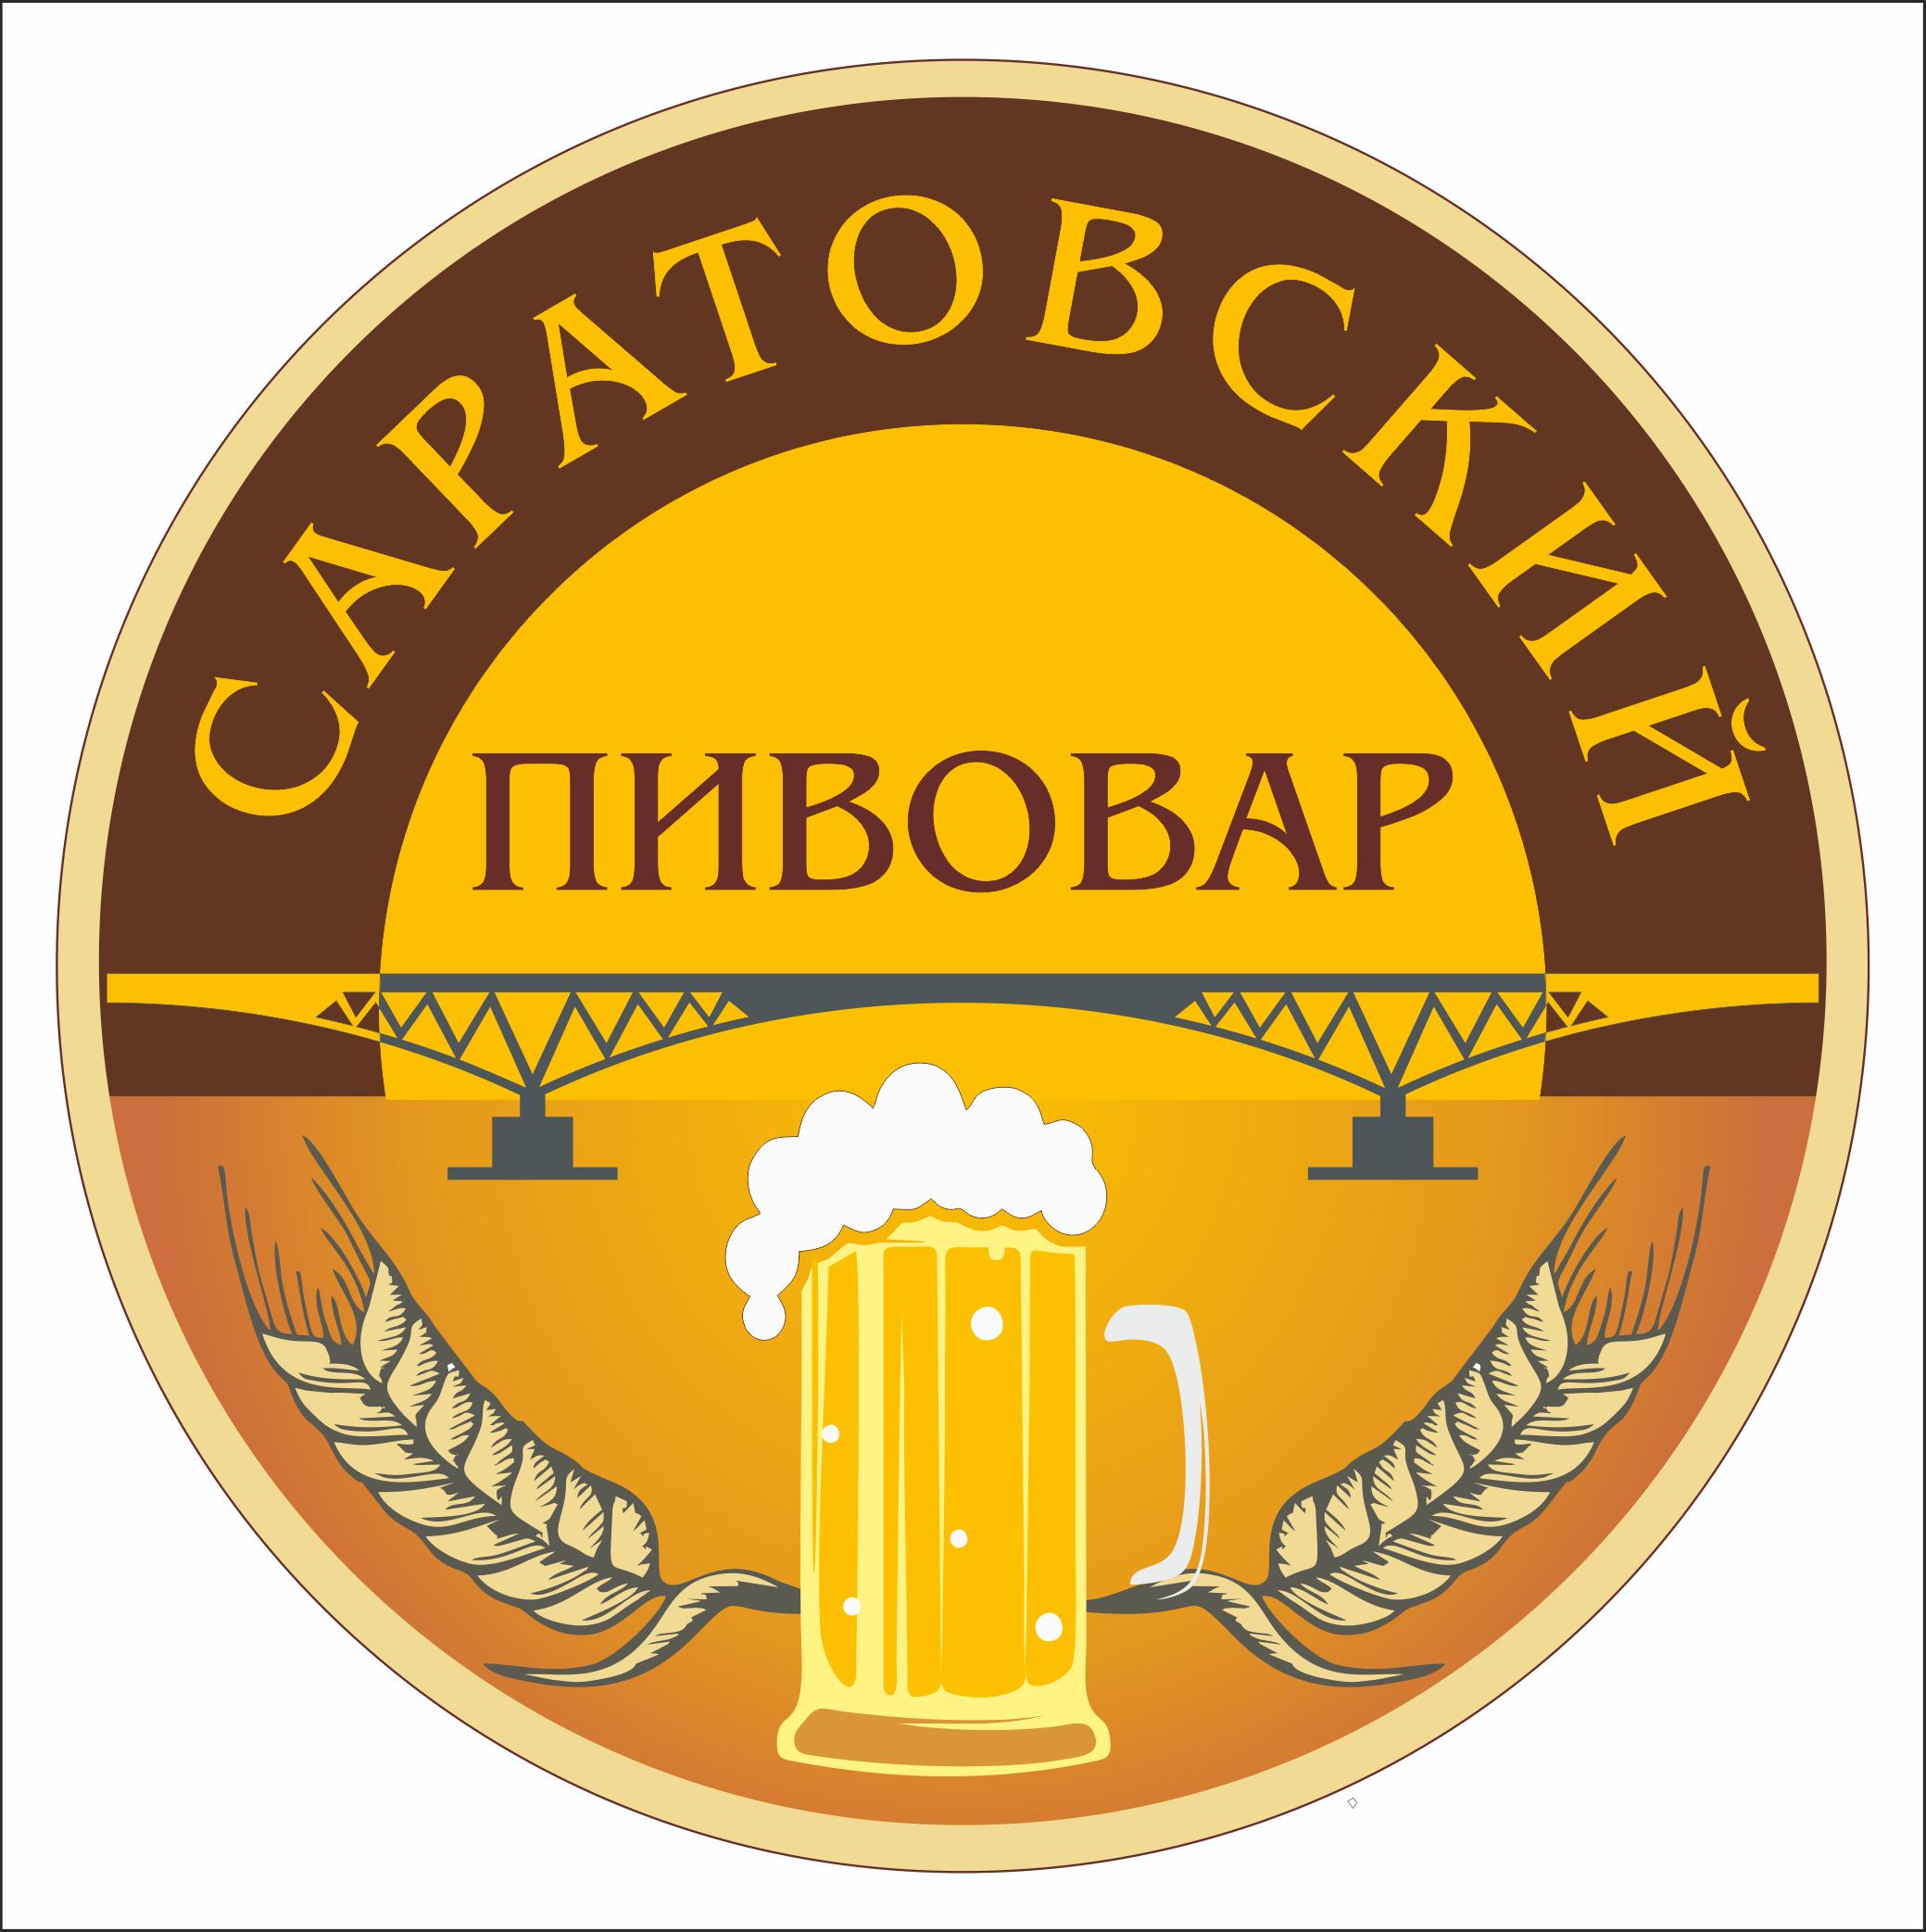 Разработка логотипа для частной пивоварни фото f_6375d7794c80bf2d.png